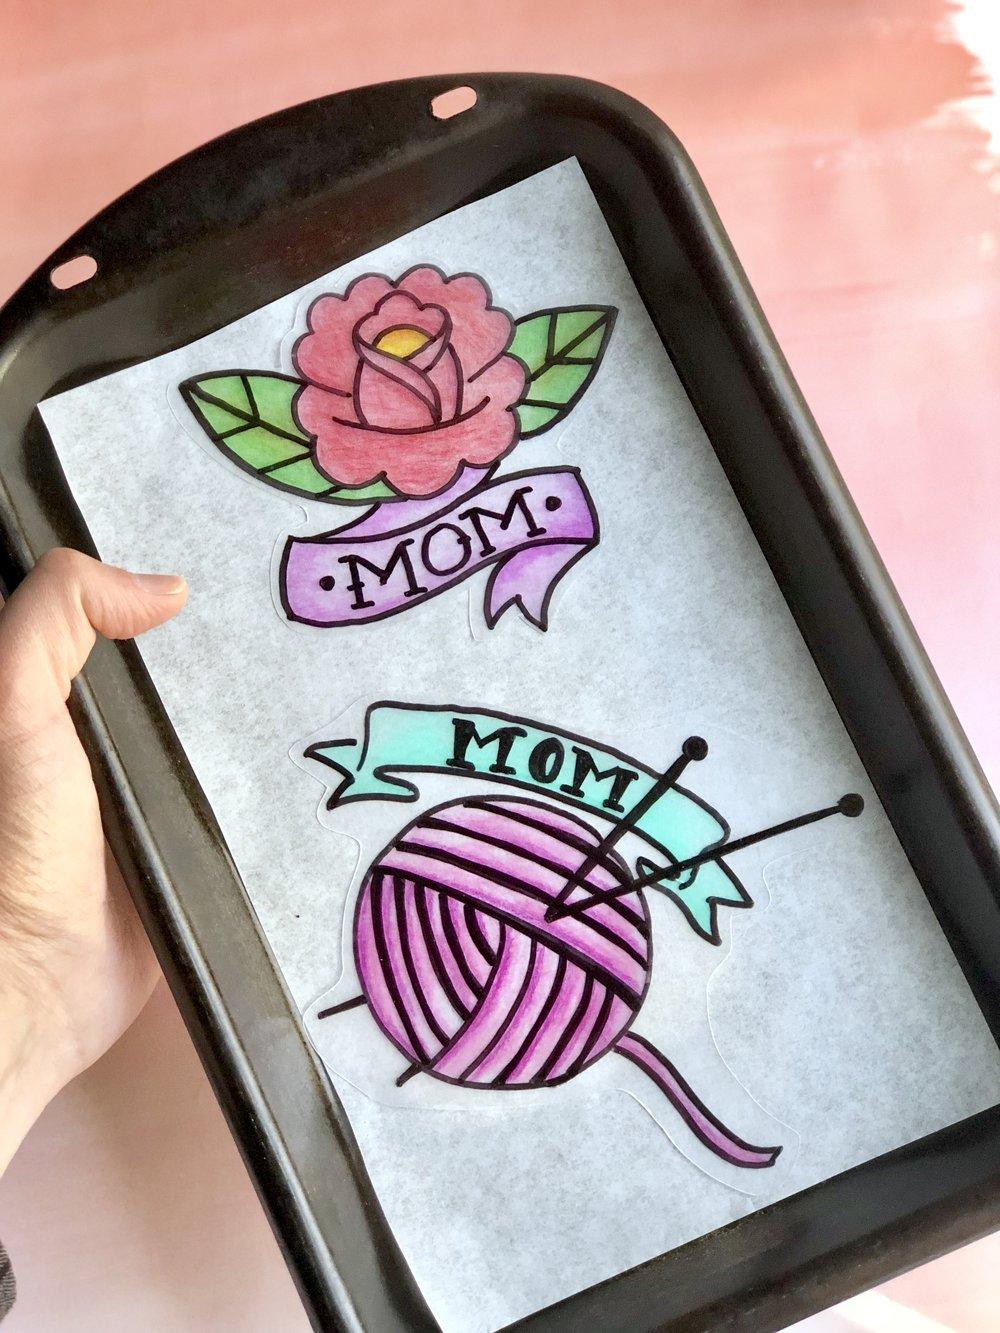 Mother's Day Shrinky Dink Mom Tattoo Pins #mothersdaydiy #mothersdaygifts #shirnkydinks #shrinkydink #shrinkydinkideas #diypin #diybrooch #momtatto #momsday #handmadegifts #giftsformom #giftsforher #badassmom #craftymom #badasswomen #womansrights #futureisfemale